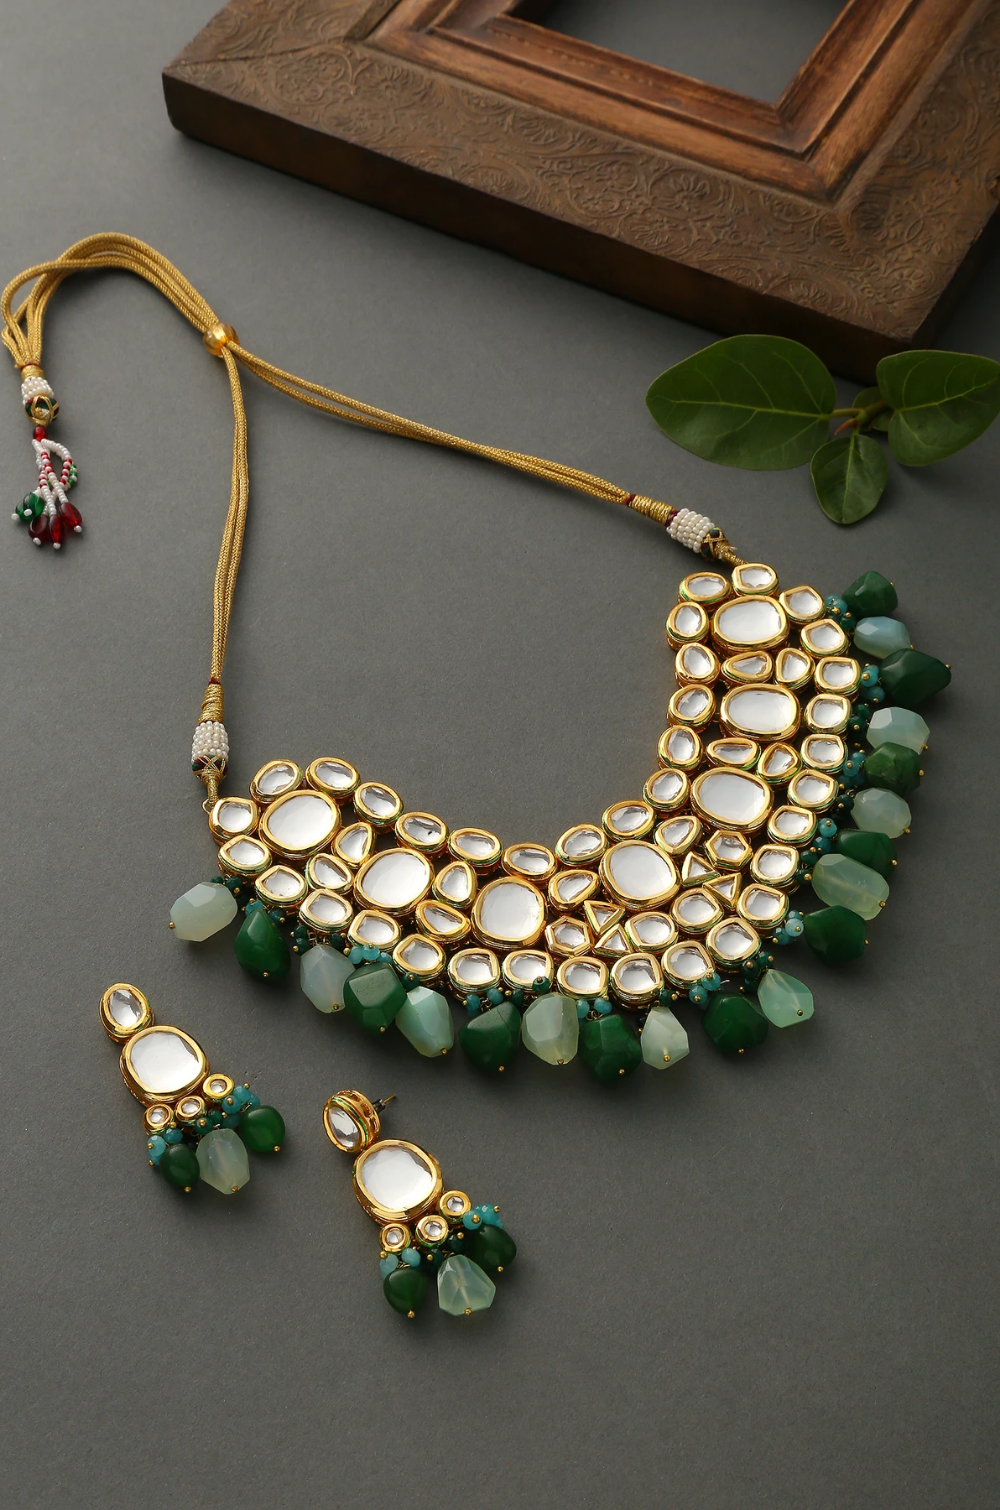 Designer Kundan pendant finish Choker jewelry Set With Earrings For Women WeddingFestive Wear Designer Choker Necklace Jewelry Set